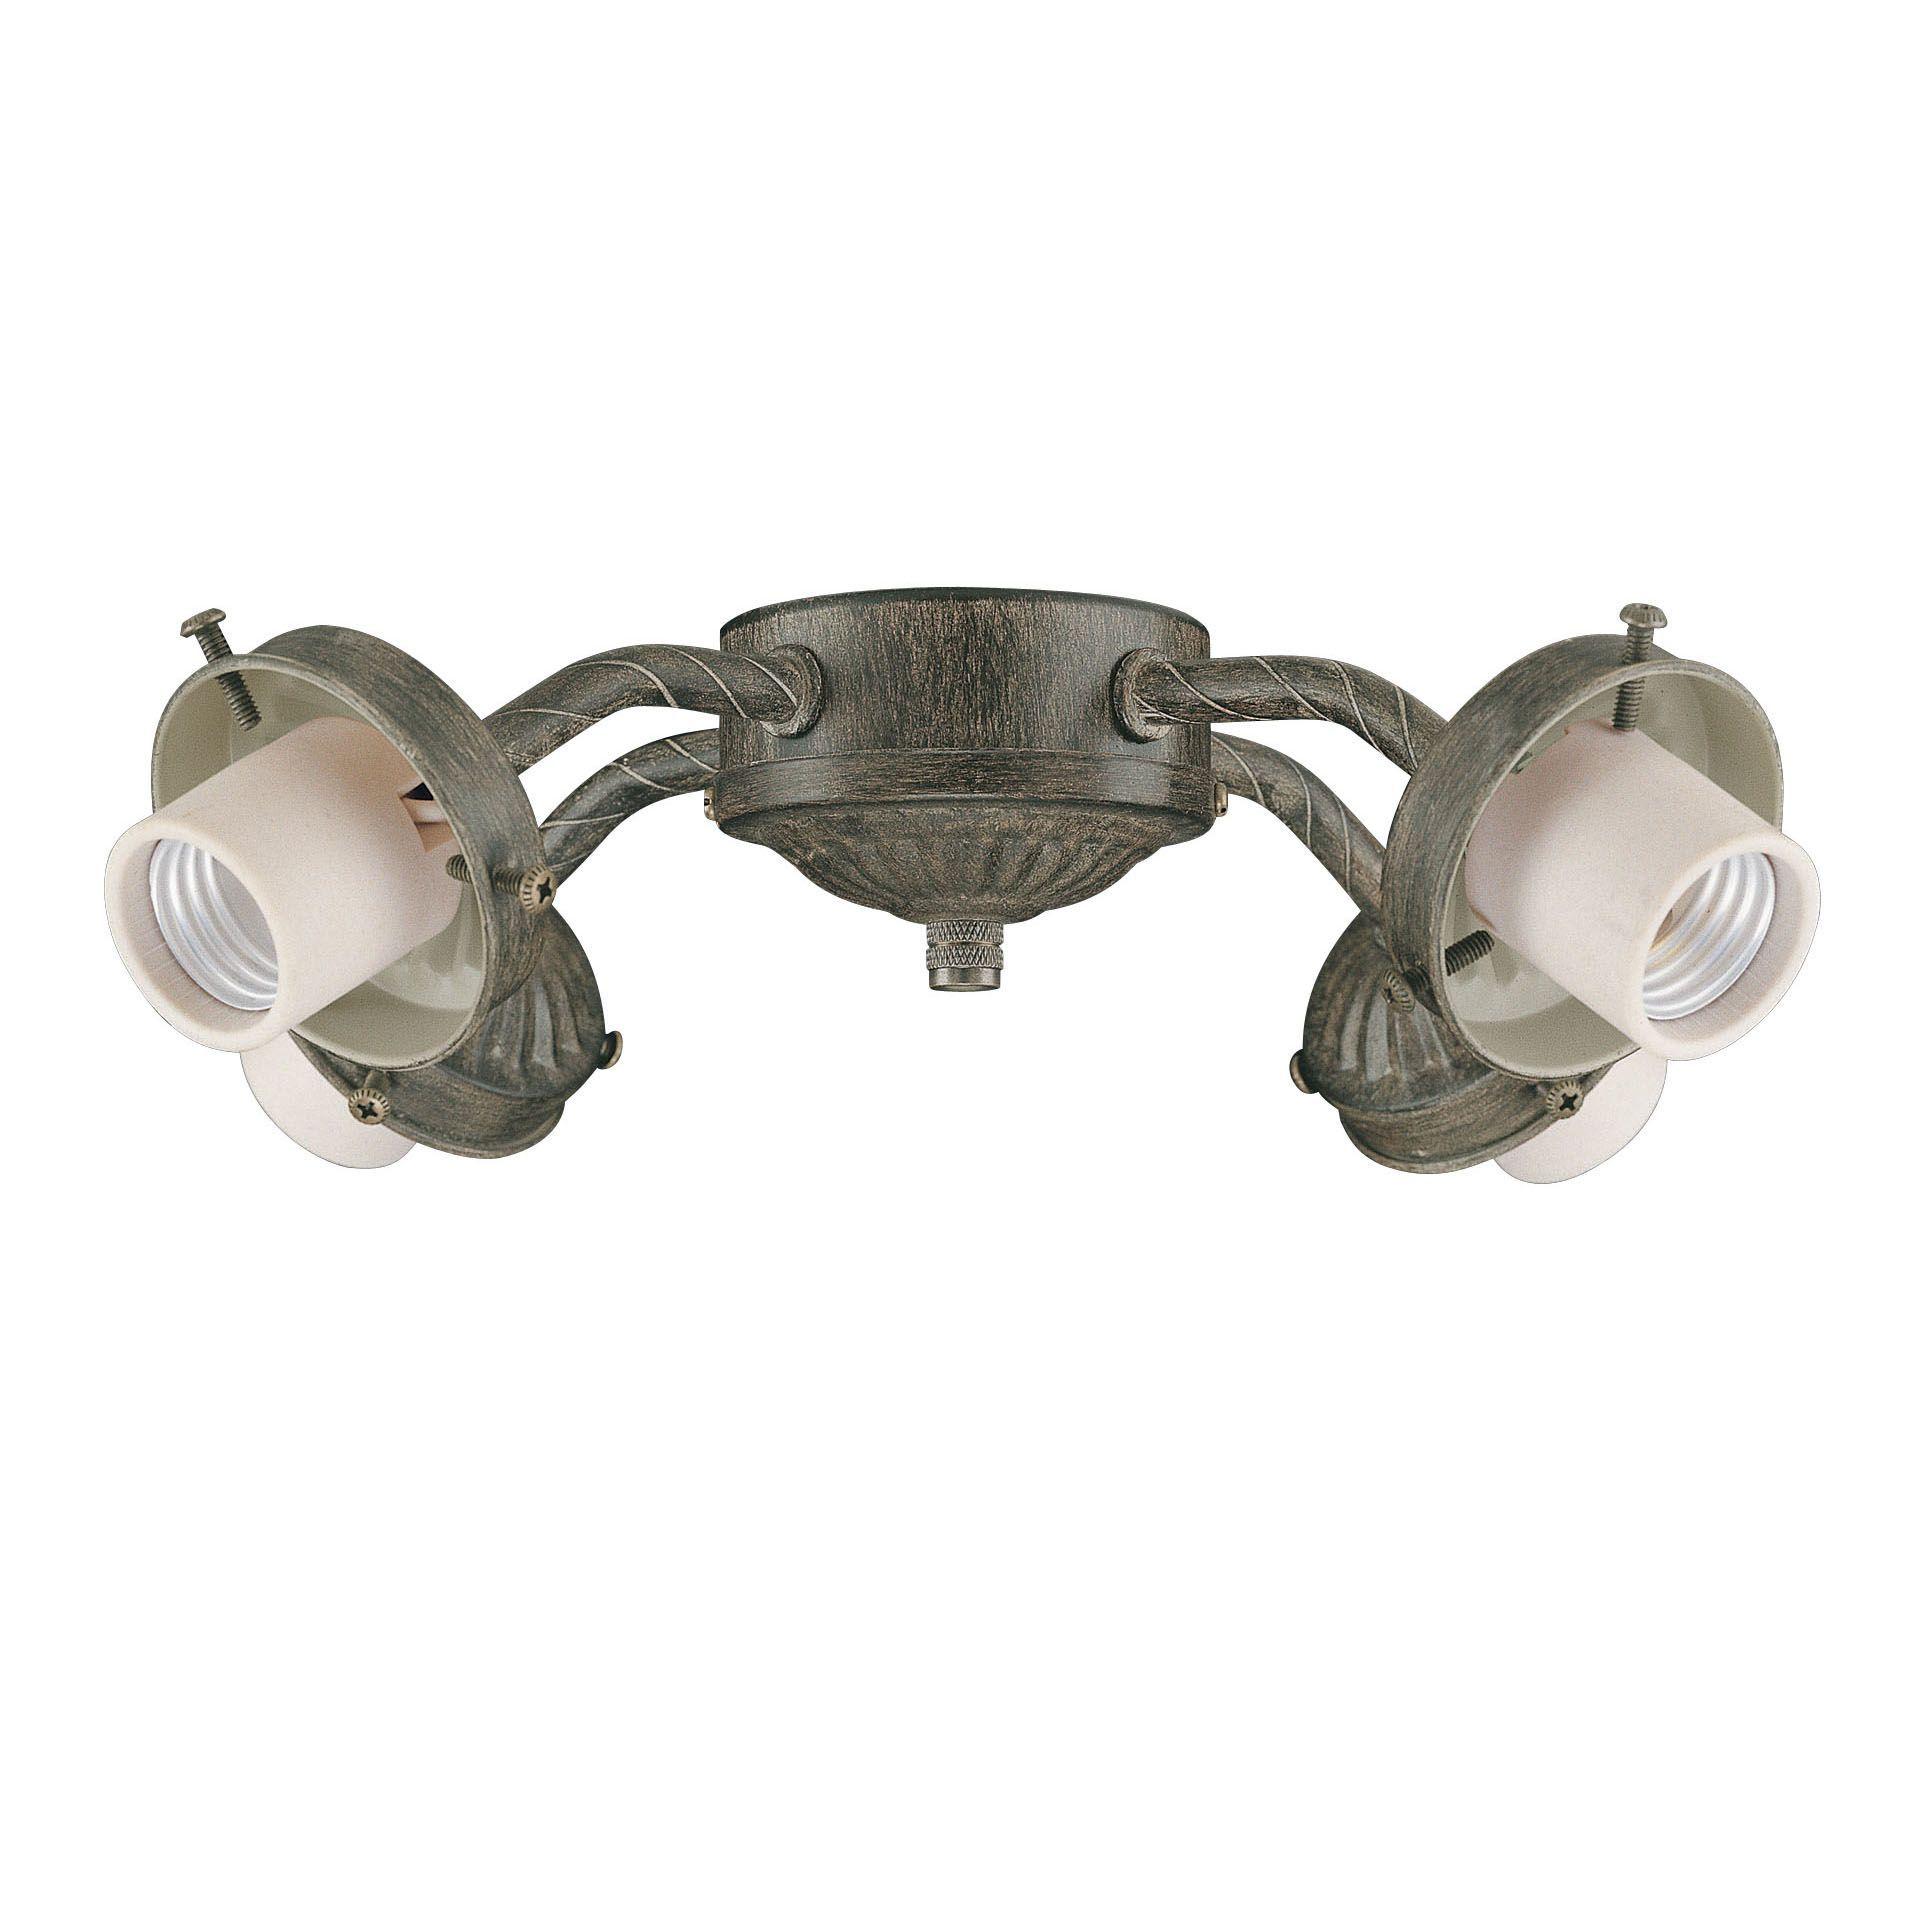 Four Light Aged Pecan Ceiling Fan Light Kit Pecan Metal